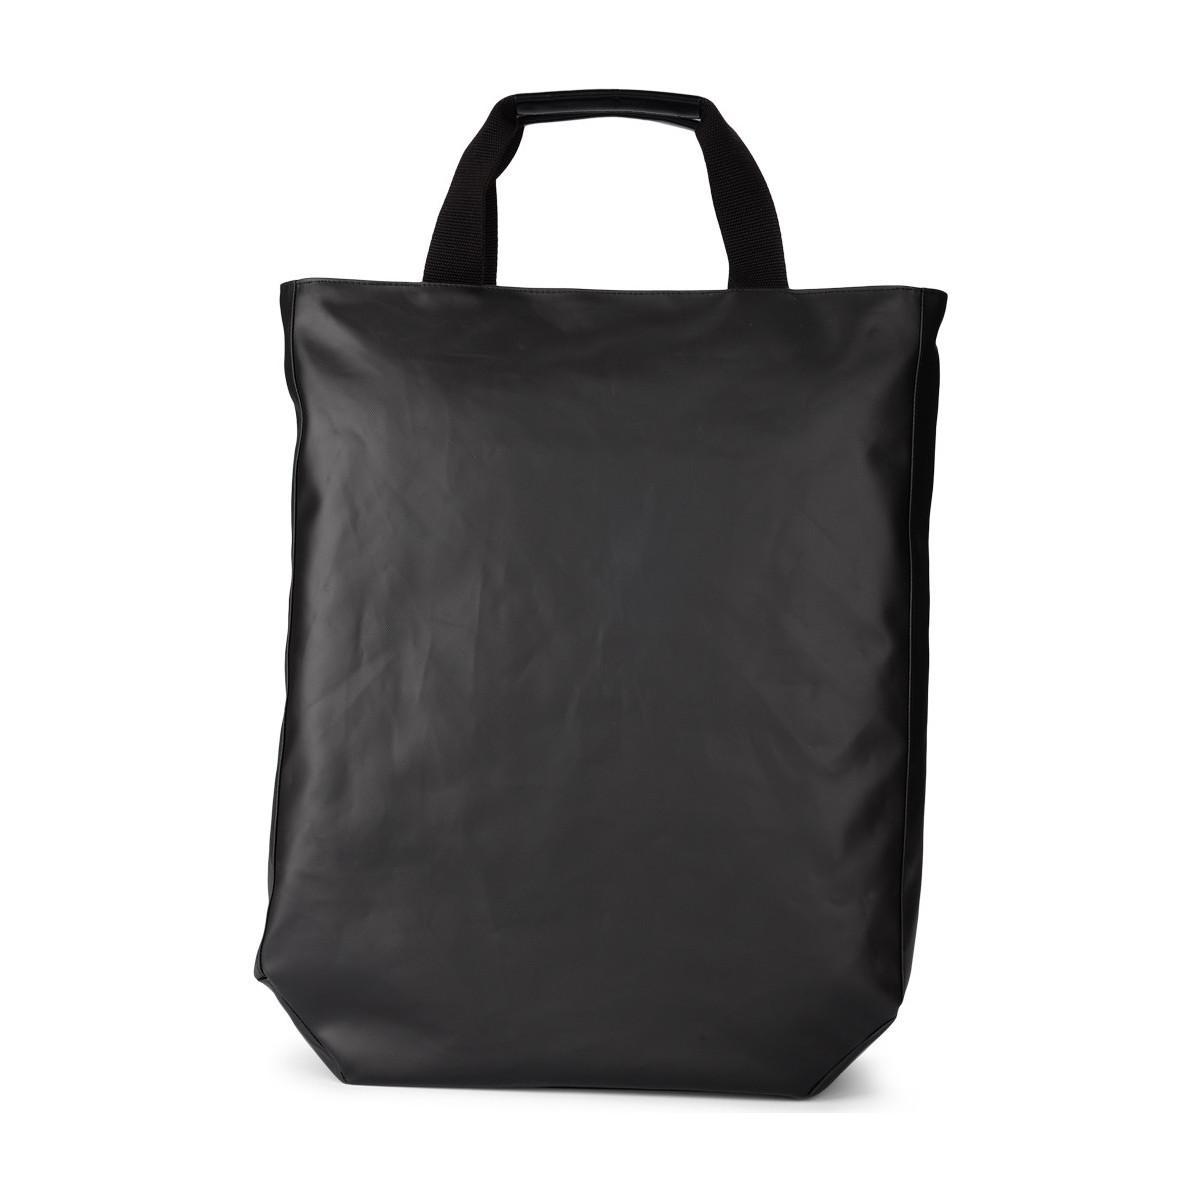 Y-3 Canvas Logo Tote Bag in Black for Men